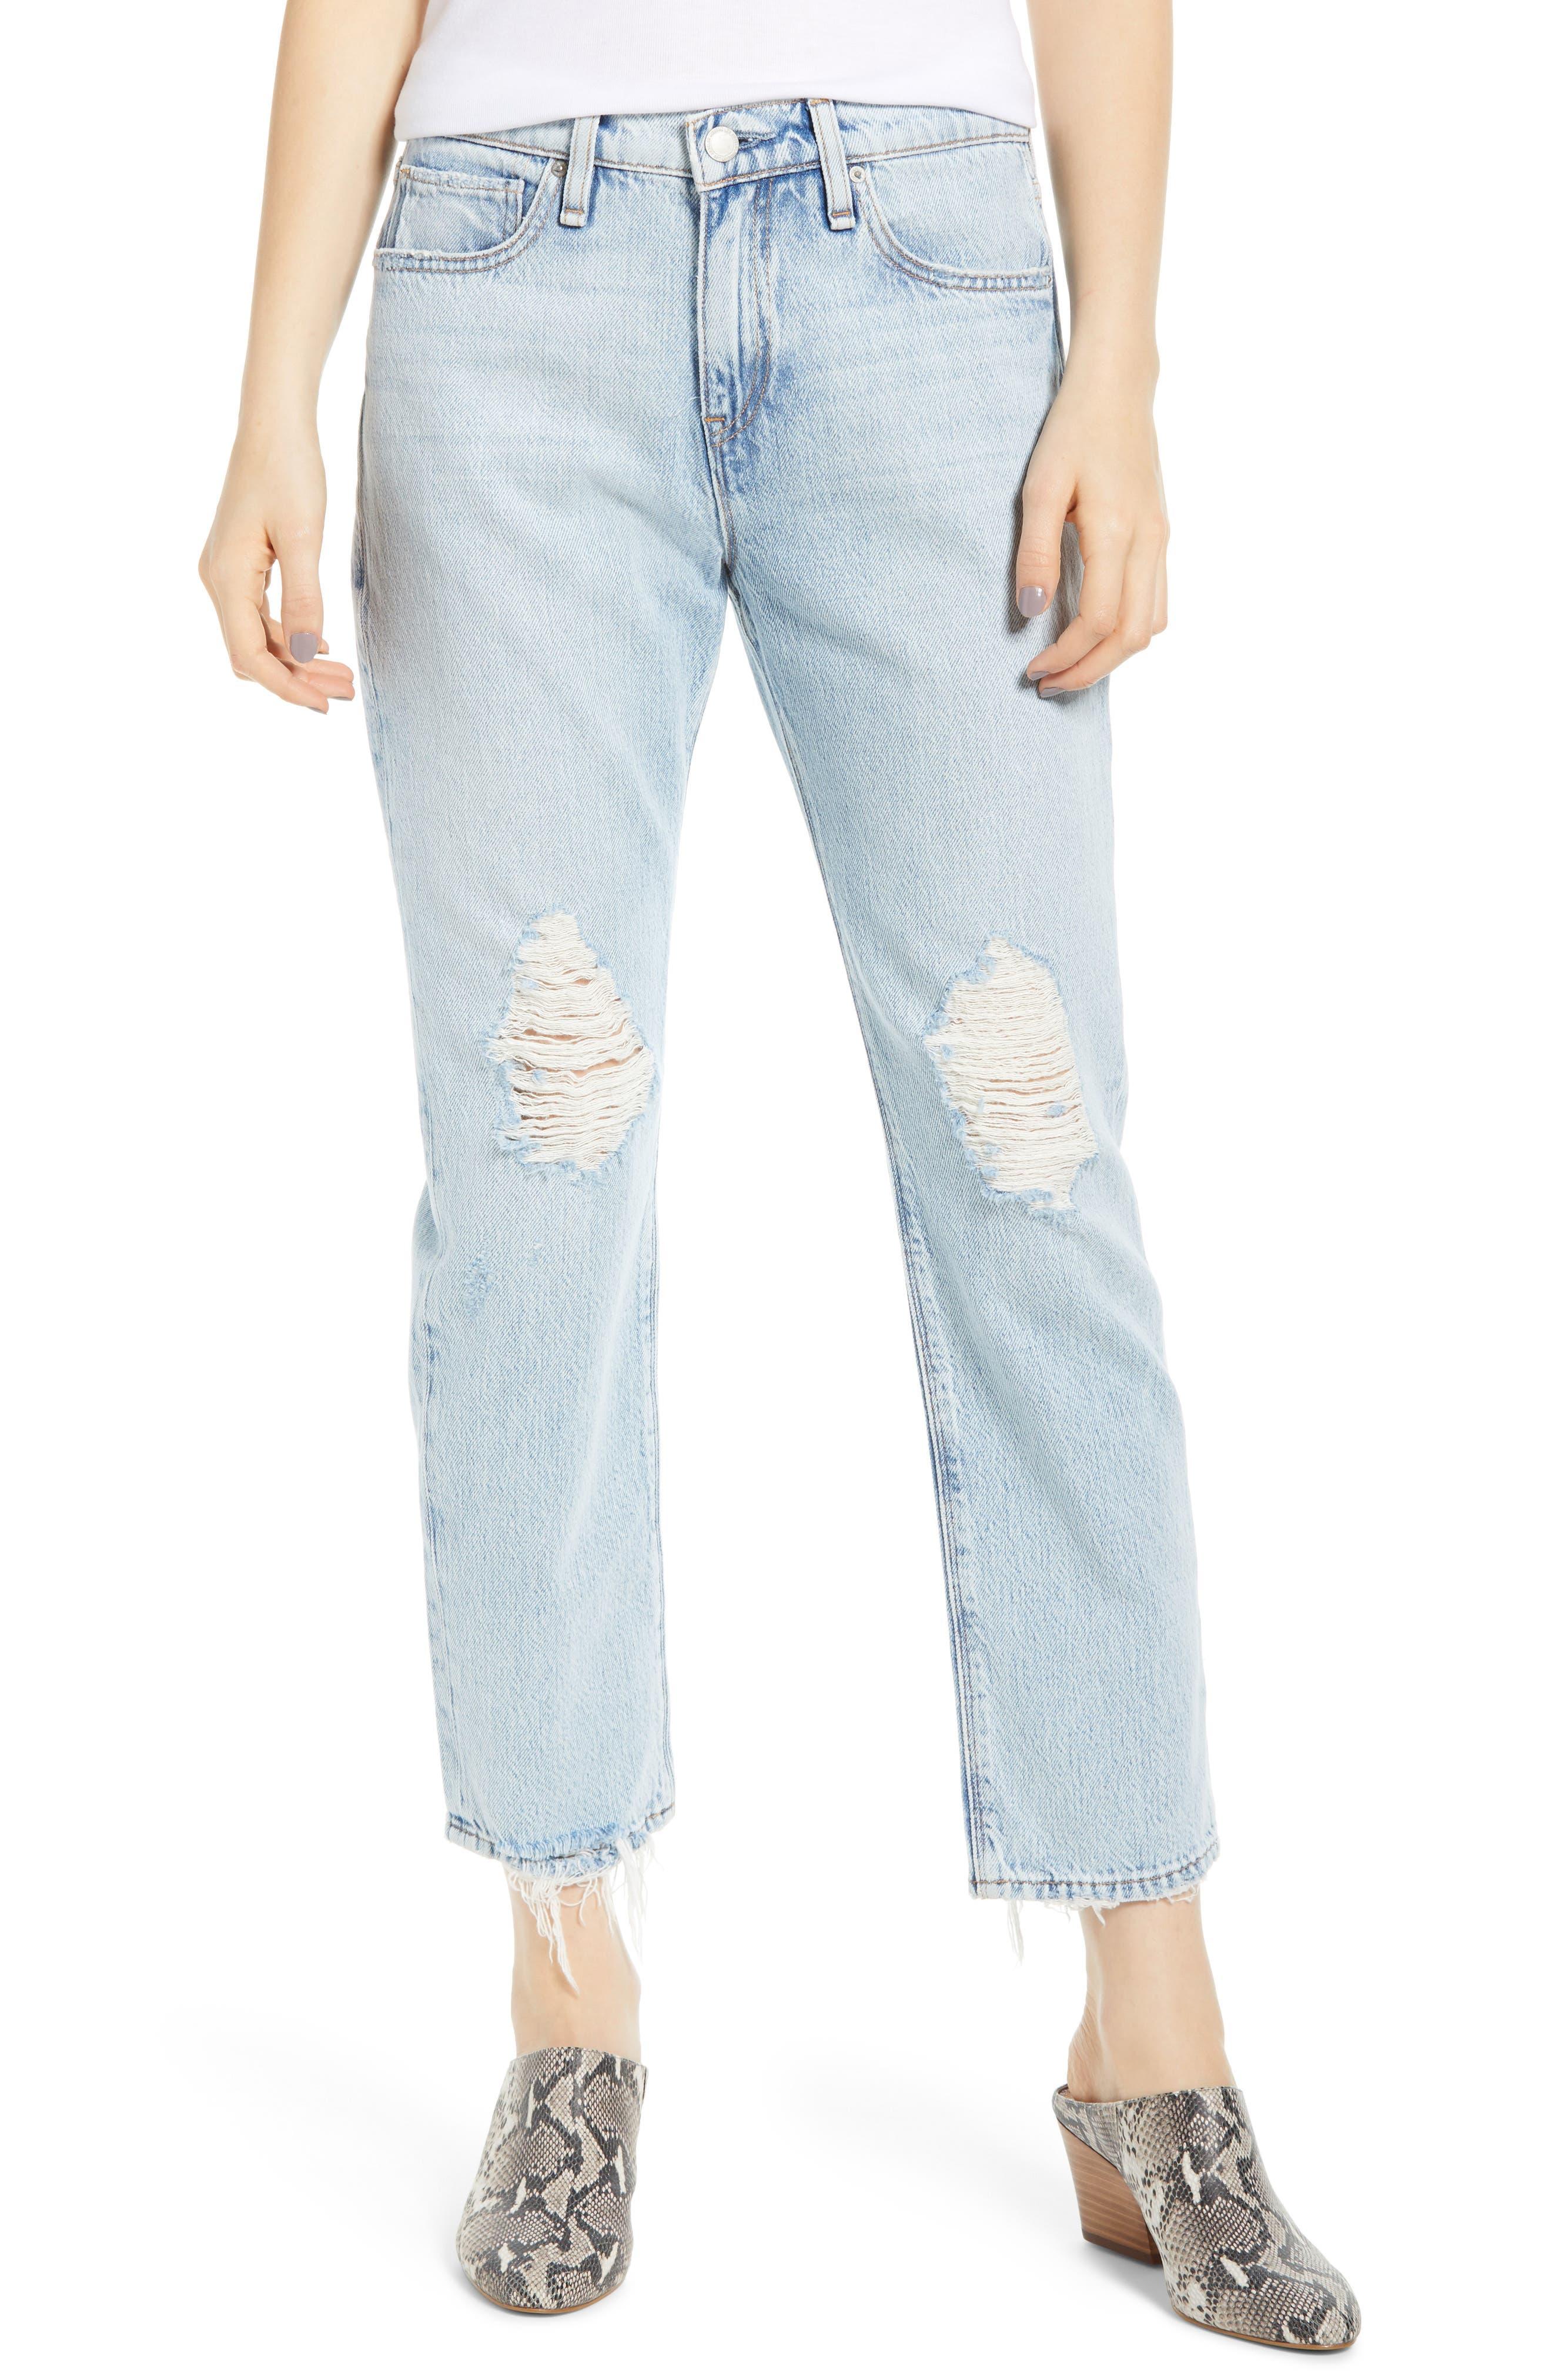 HUDSON JEANS Jessi Ripped Crop Boyfriend Jeans, Main, color, SAVE TONIGHT